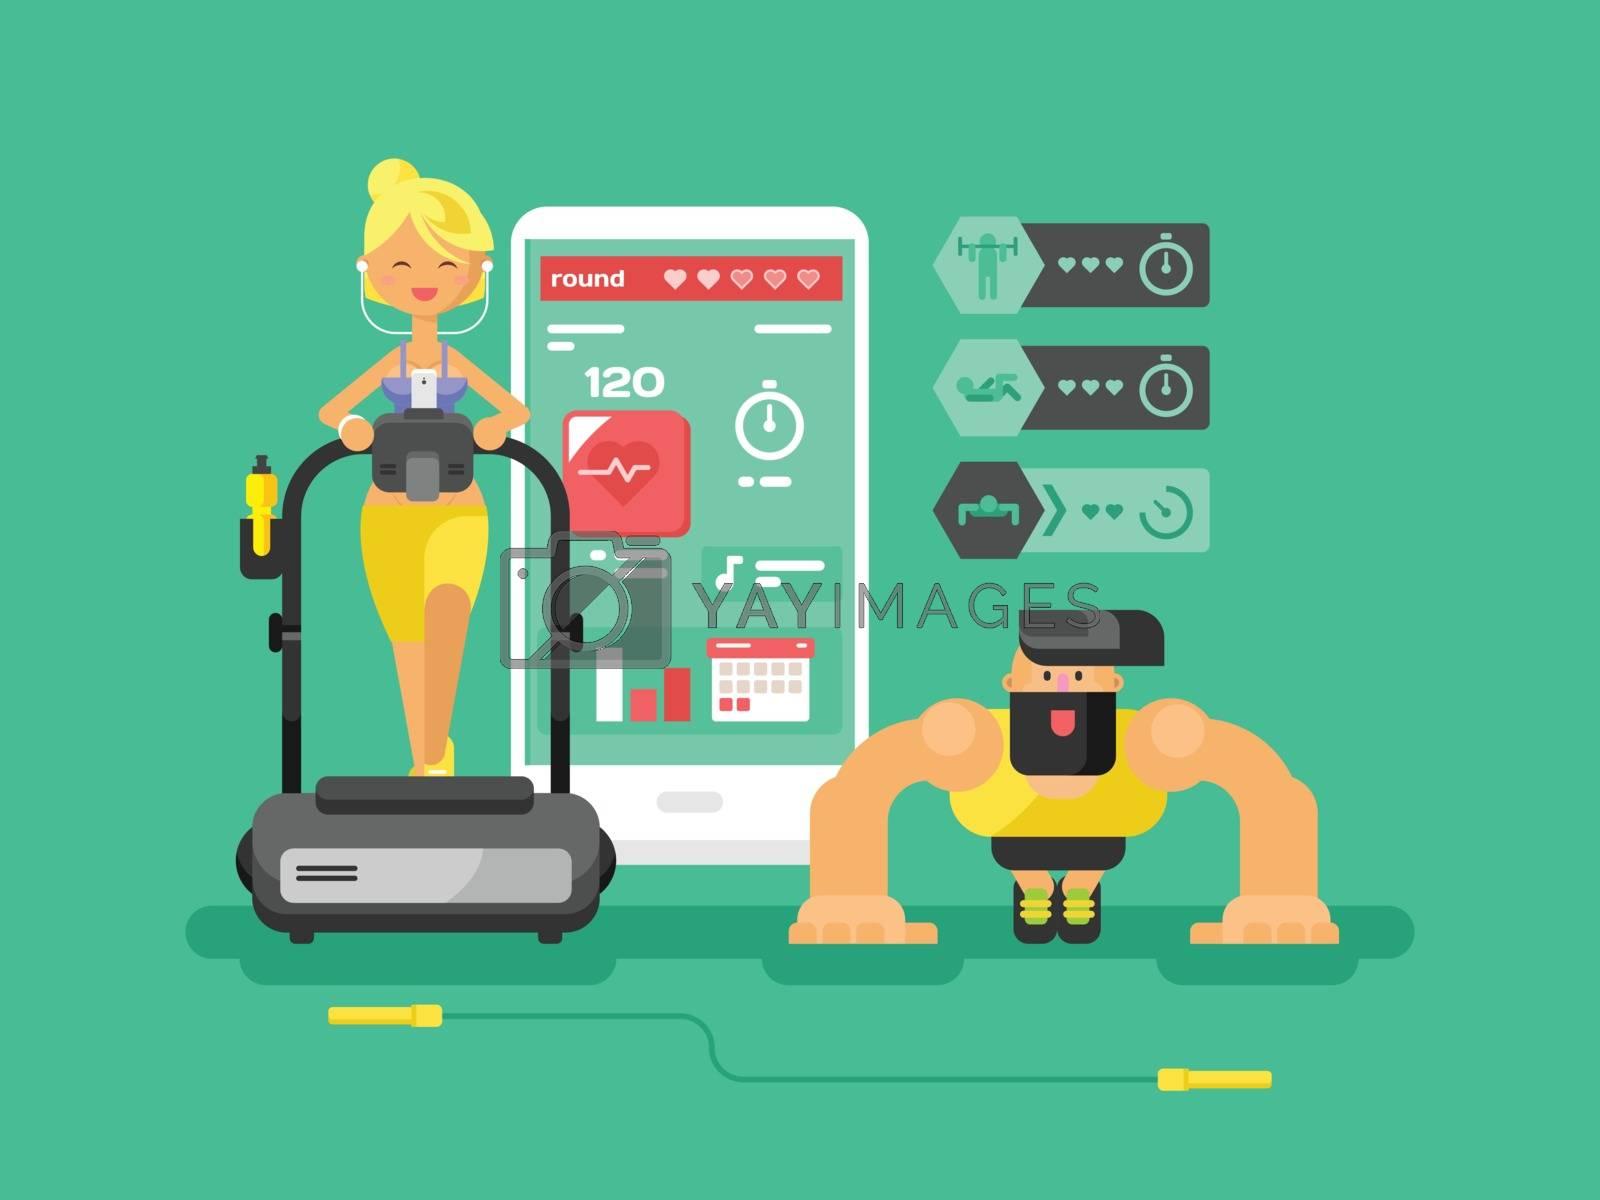 Ffitness app man and woman flat design. Sport health, mobile interface, smart gadget technology, vector illustration